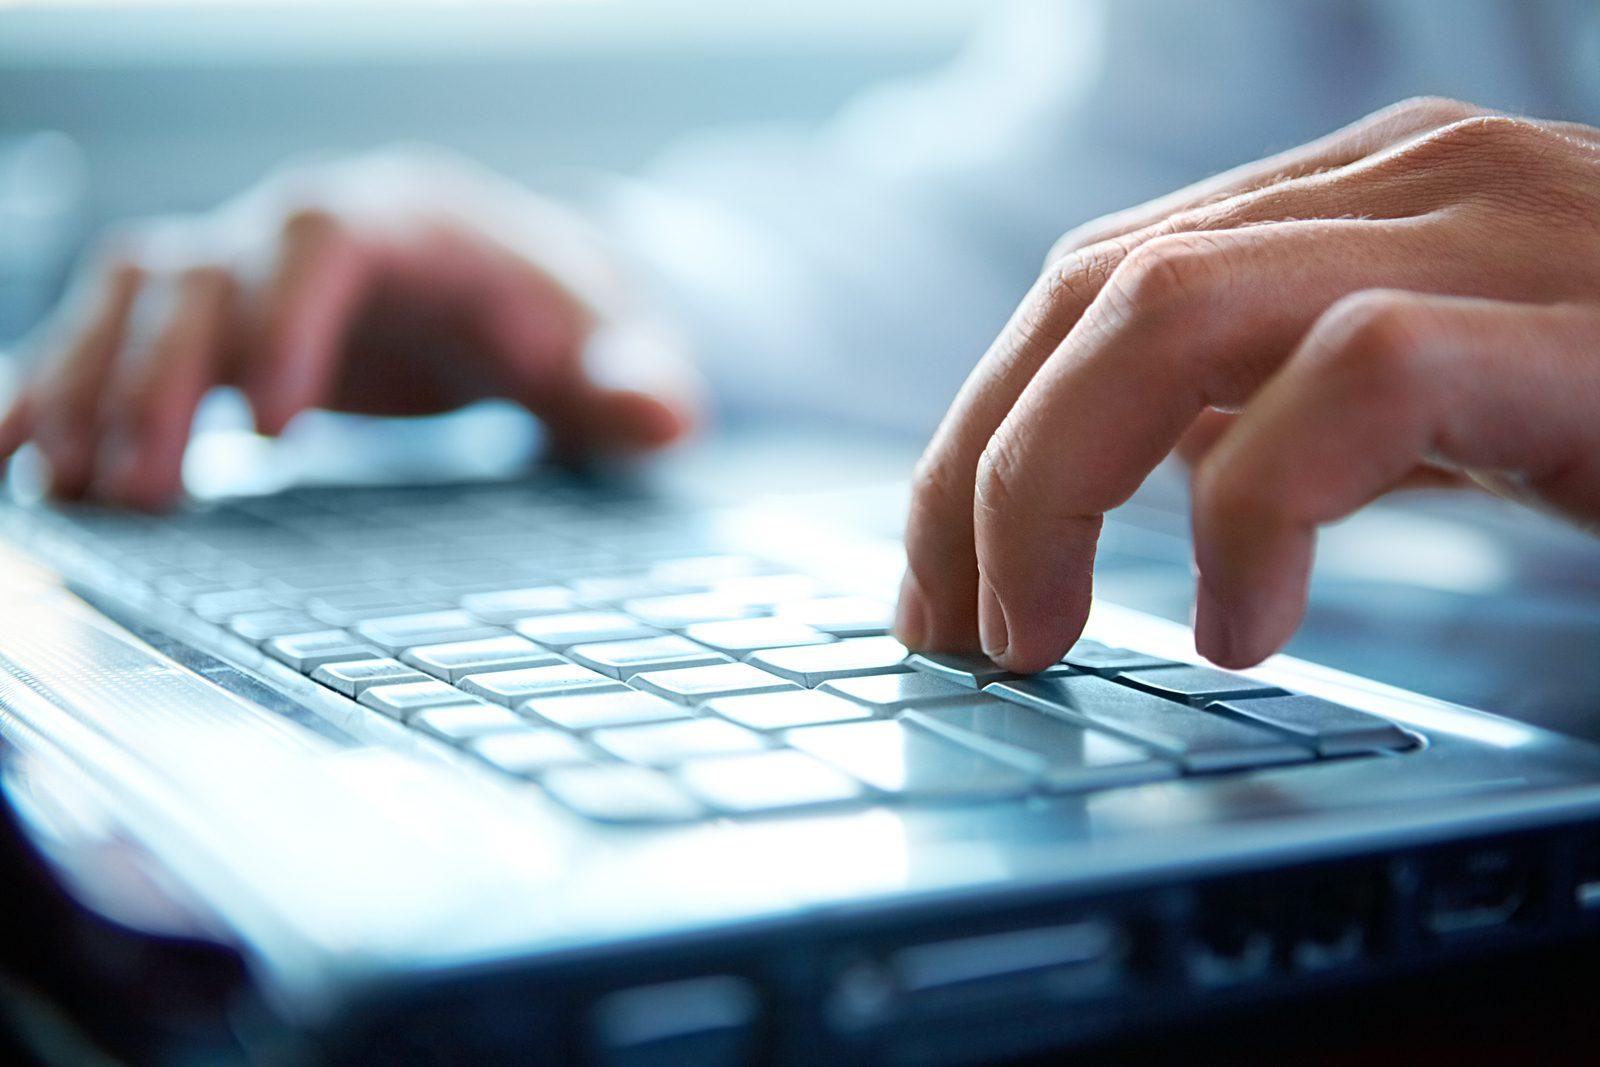 Top university essay ghostwriter site gb ielts writing